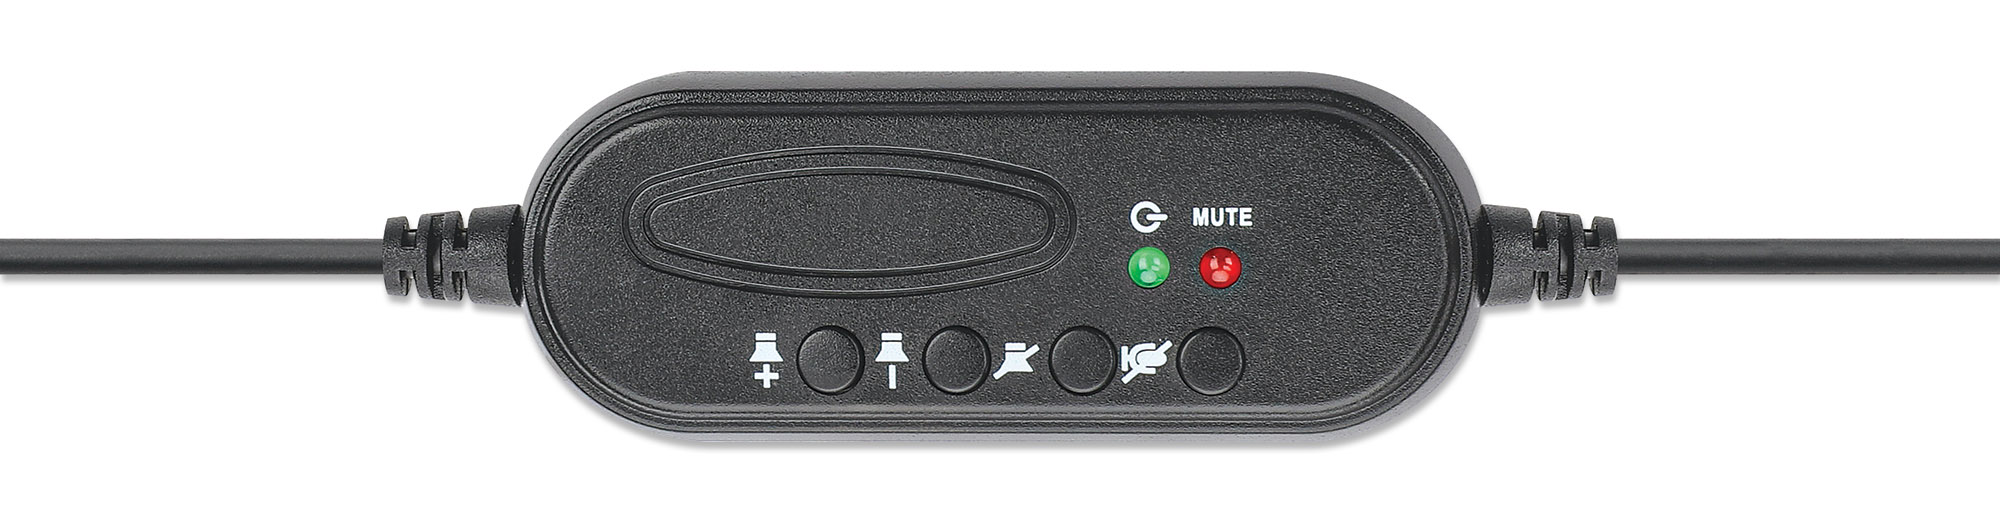 Mono USB Headset